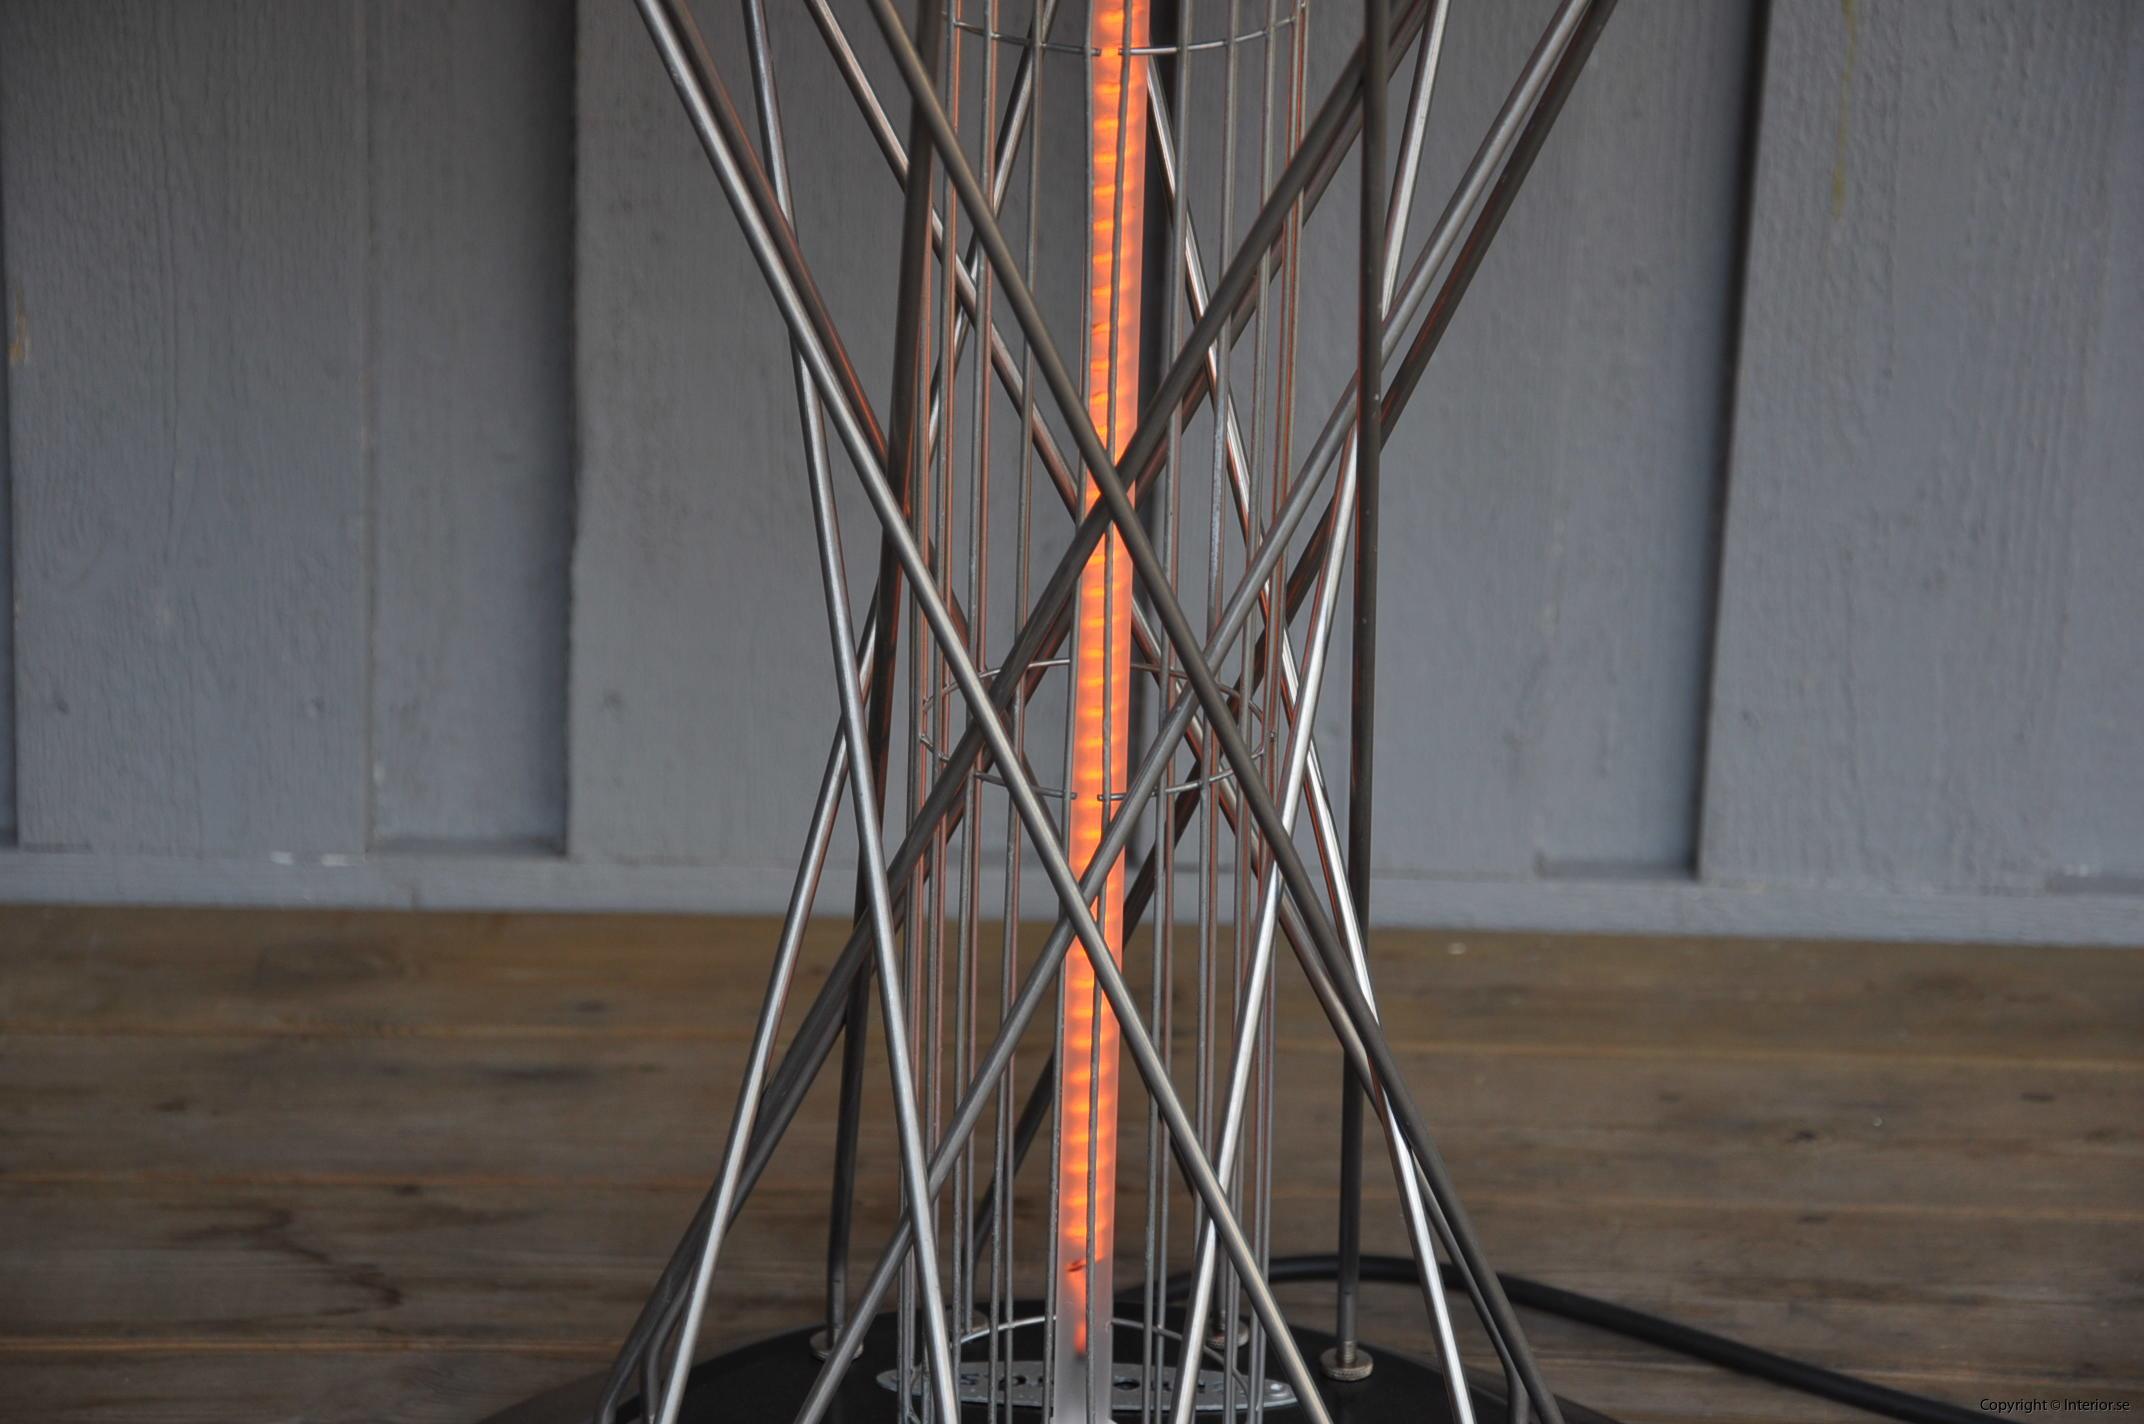 Bord med inbyggd infravärme Hyra möbler stockholm event sverige (7)